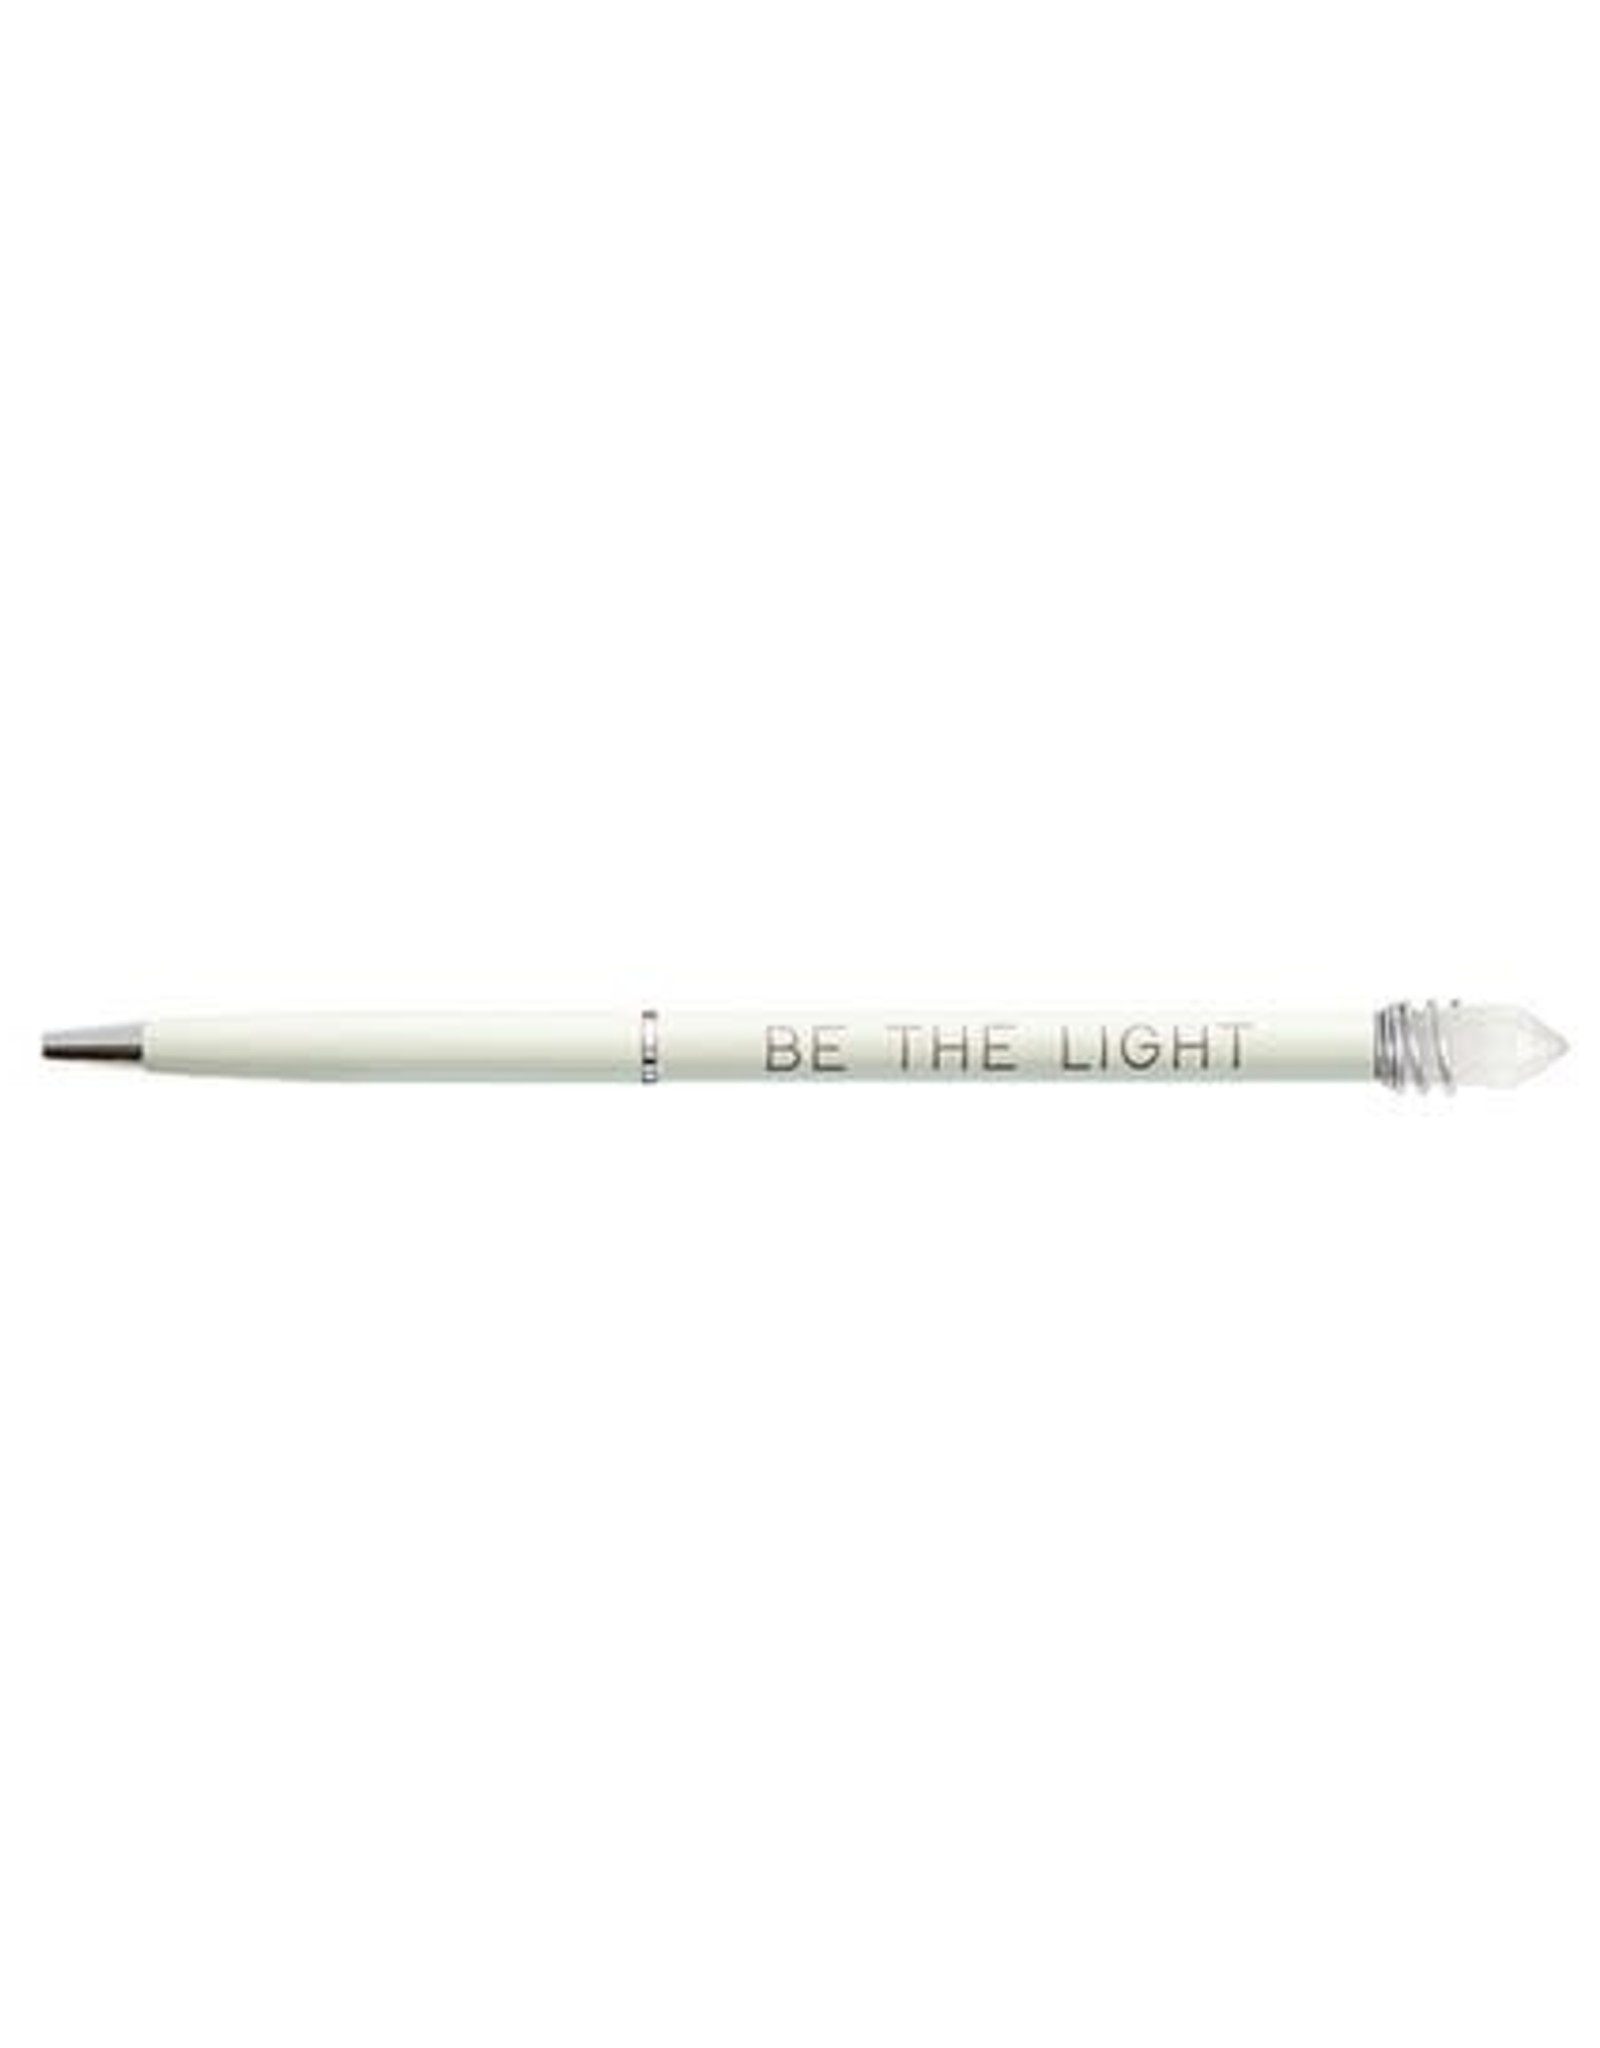 Santa Barbara Design Studio Pen Be The Light